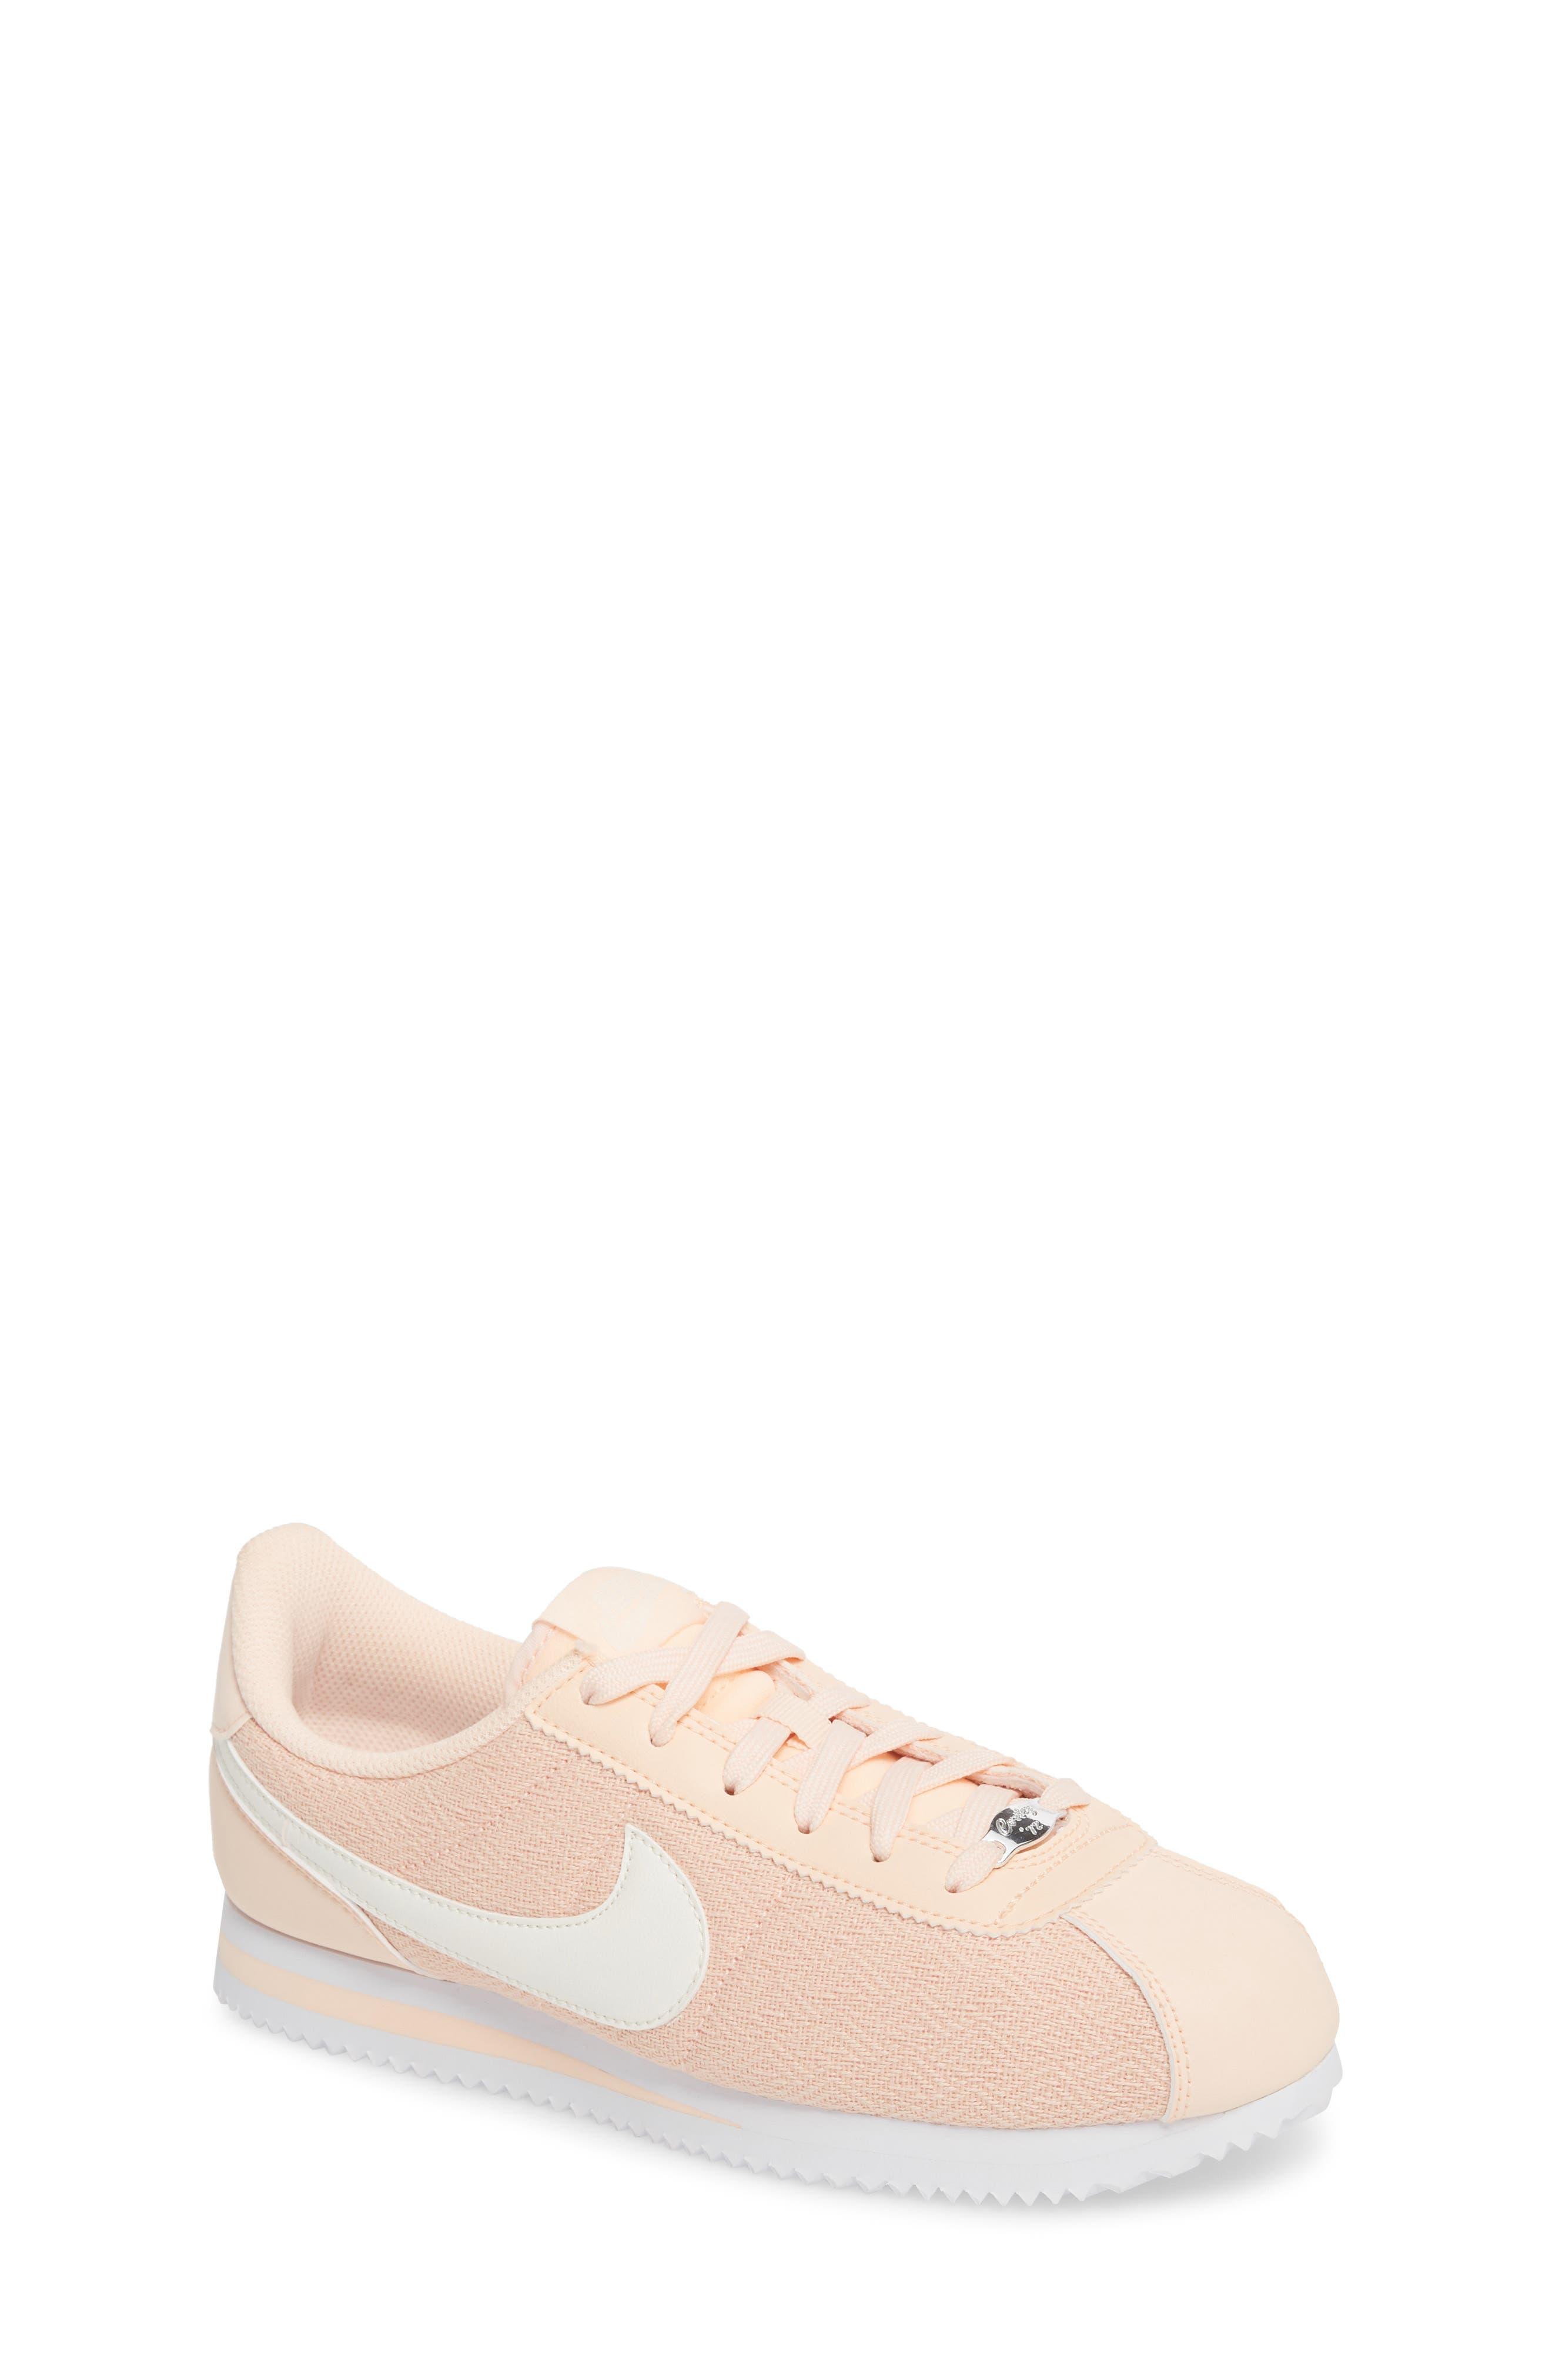 Cortez Basic TXT SE Sneaker,                         Main,                         color, Crimson Tint/ Sail/ White